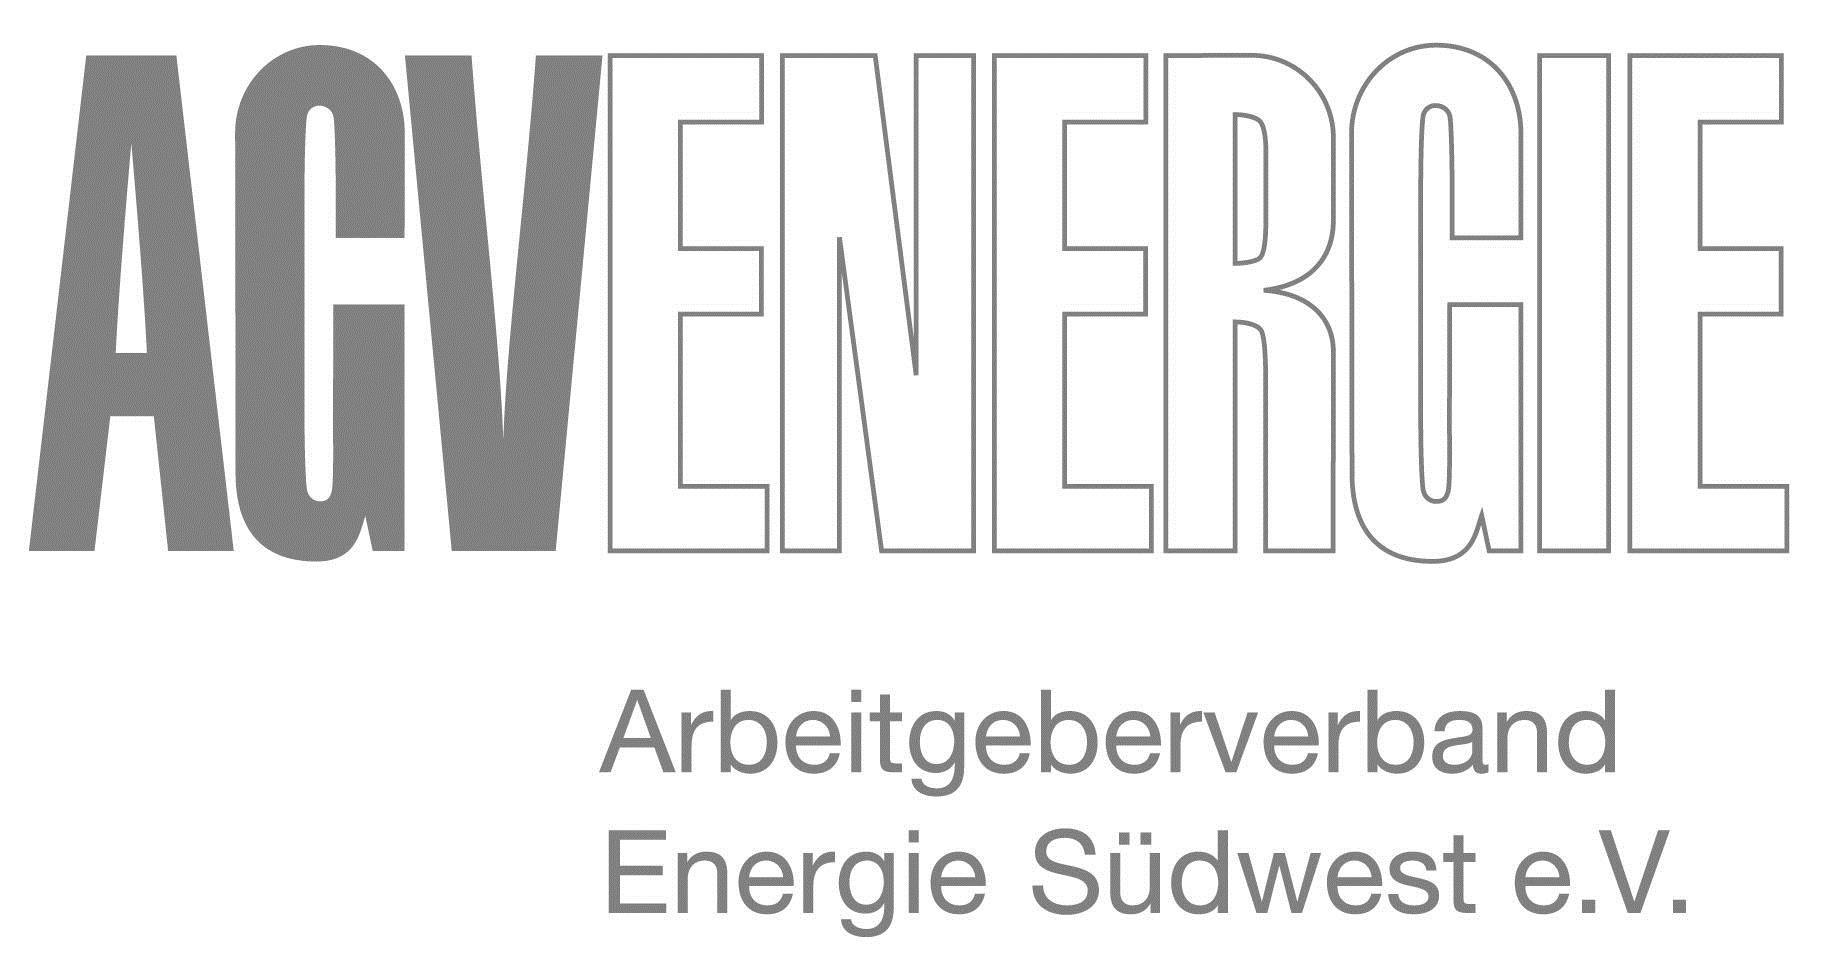 Arbeitgeberverband Energie Südwest e. V.